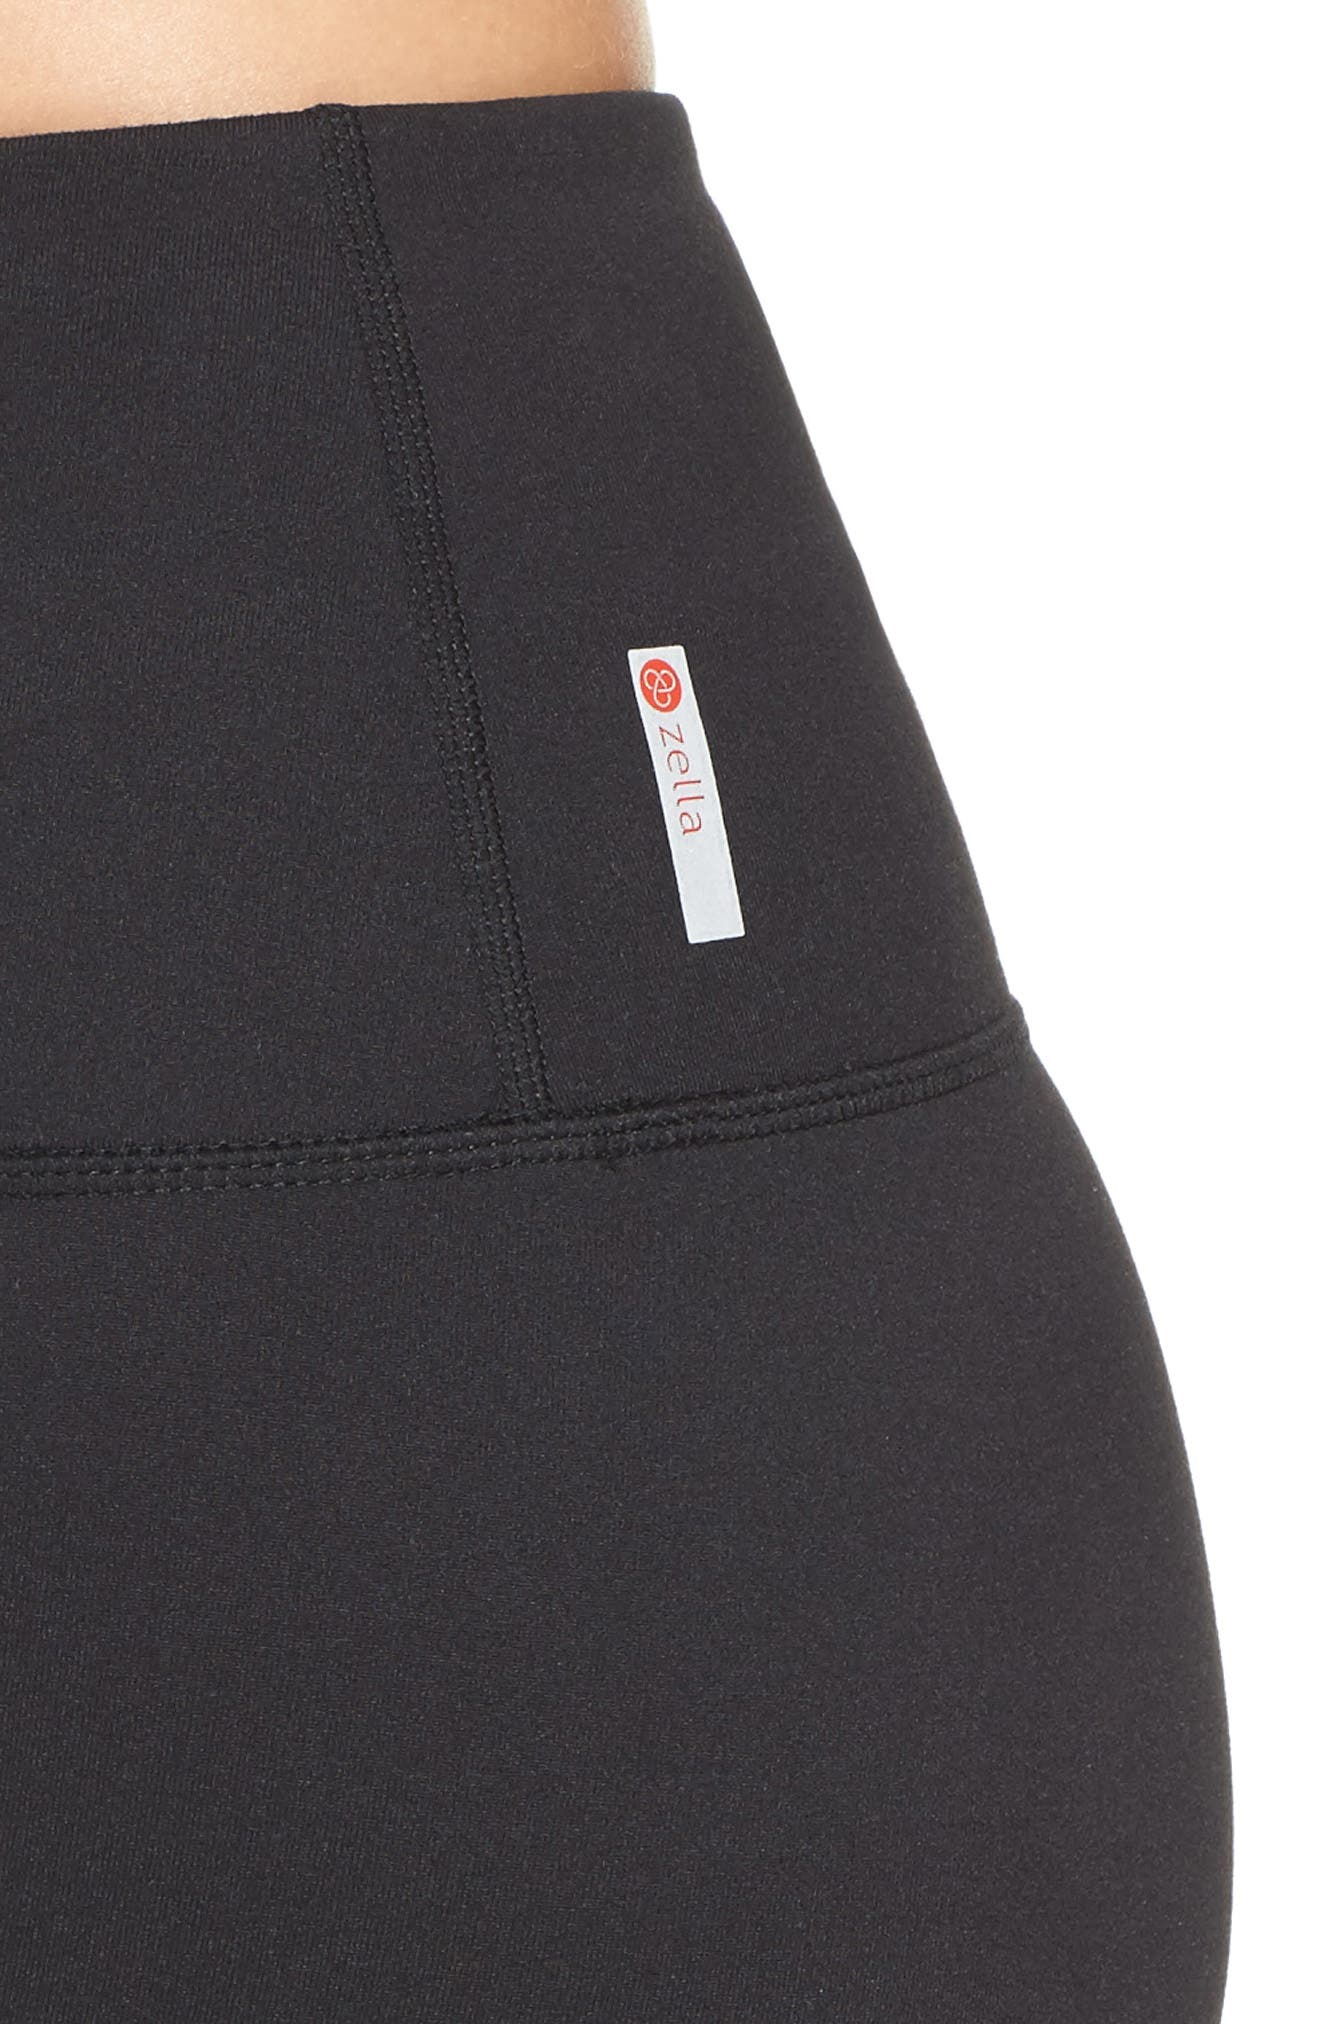 Mia High Waist Mesh Bike Shorts,                             Alternate thumbnail 4, color,                             Black